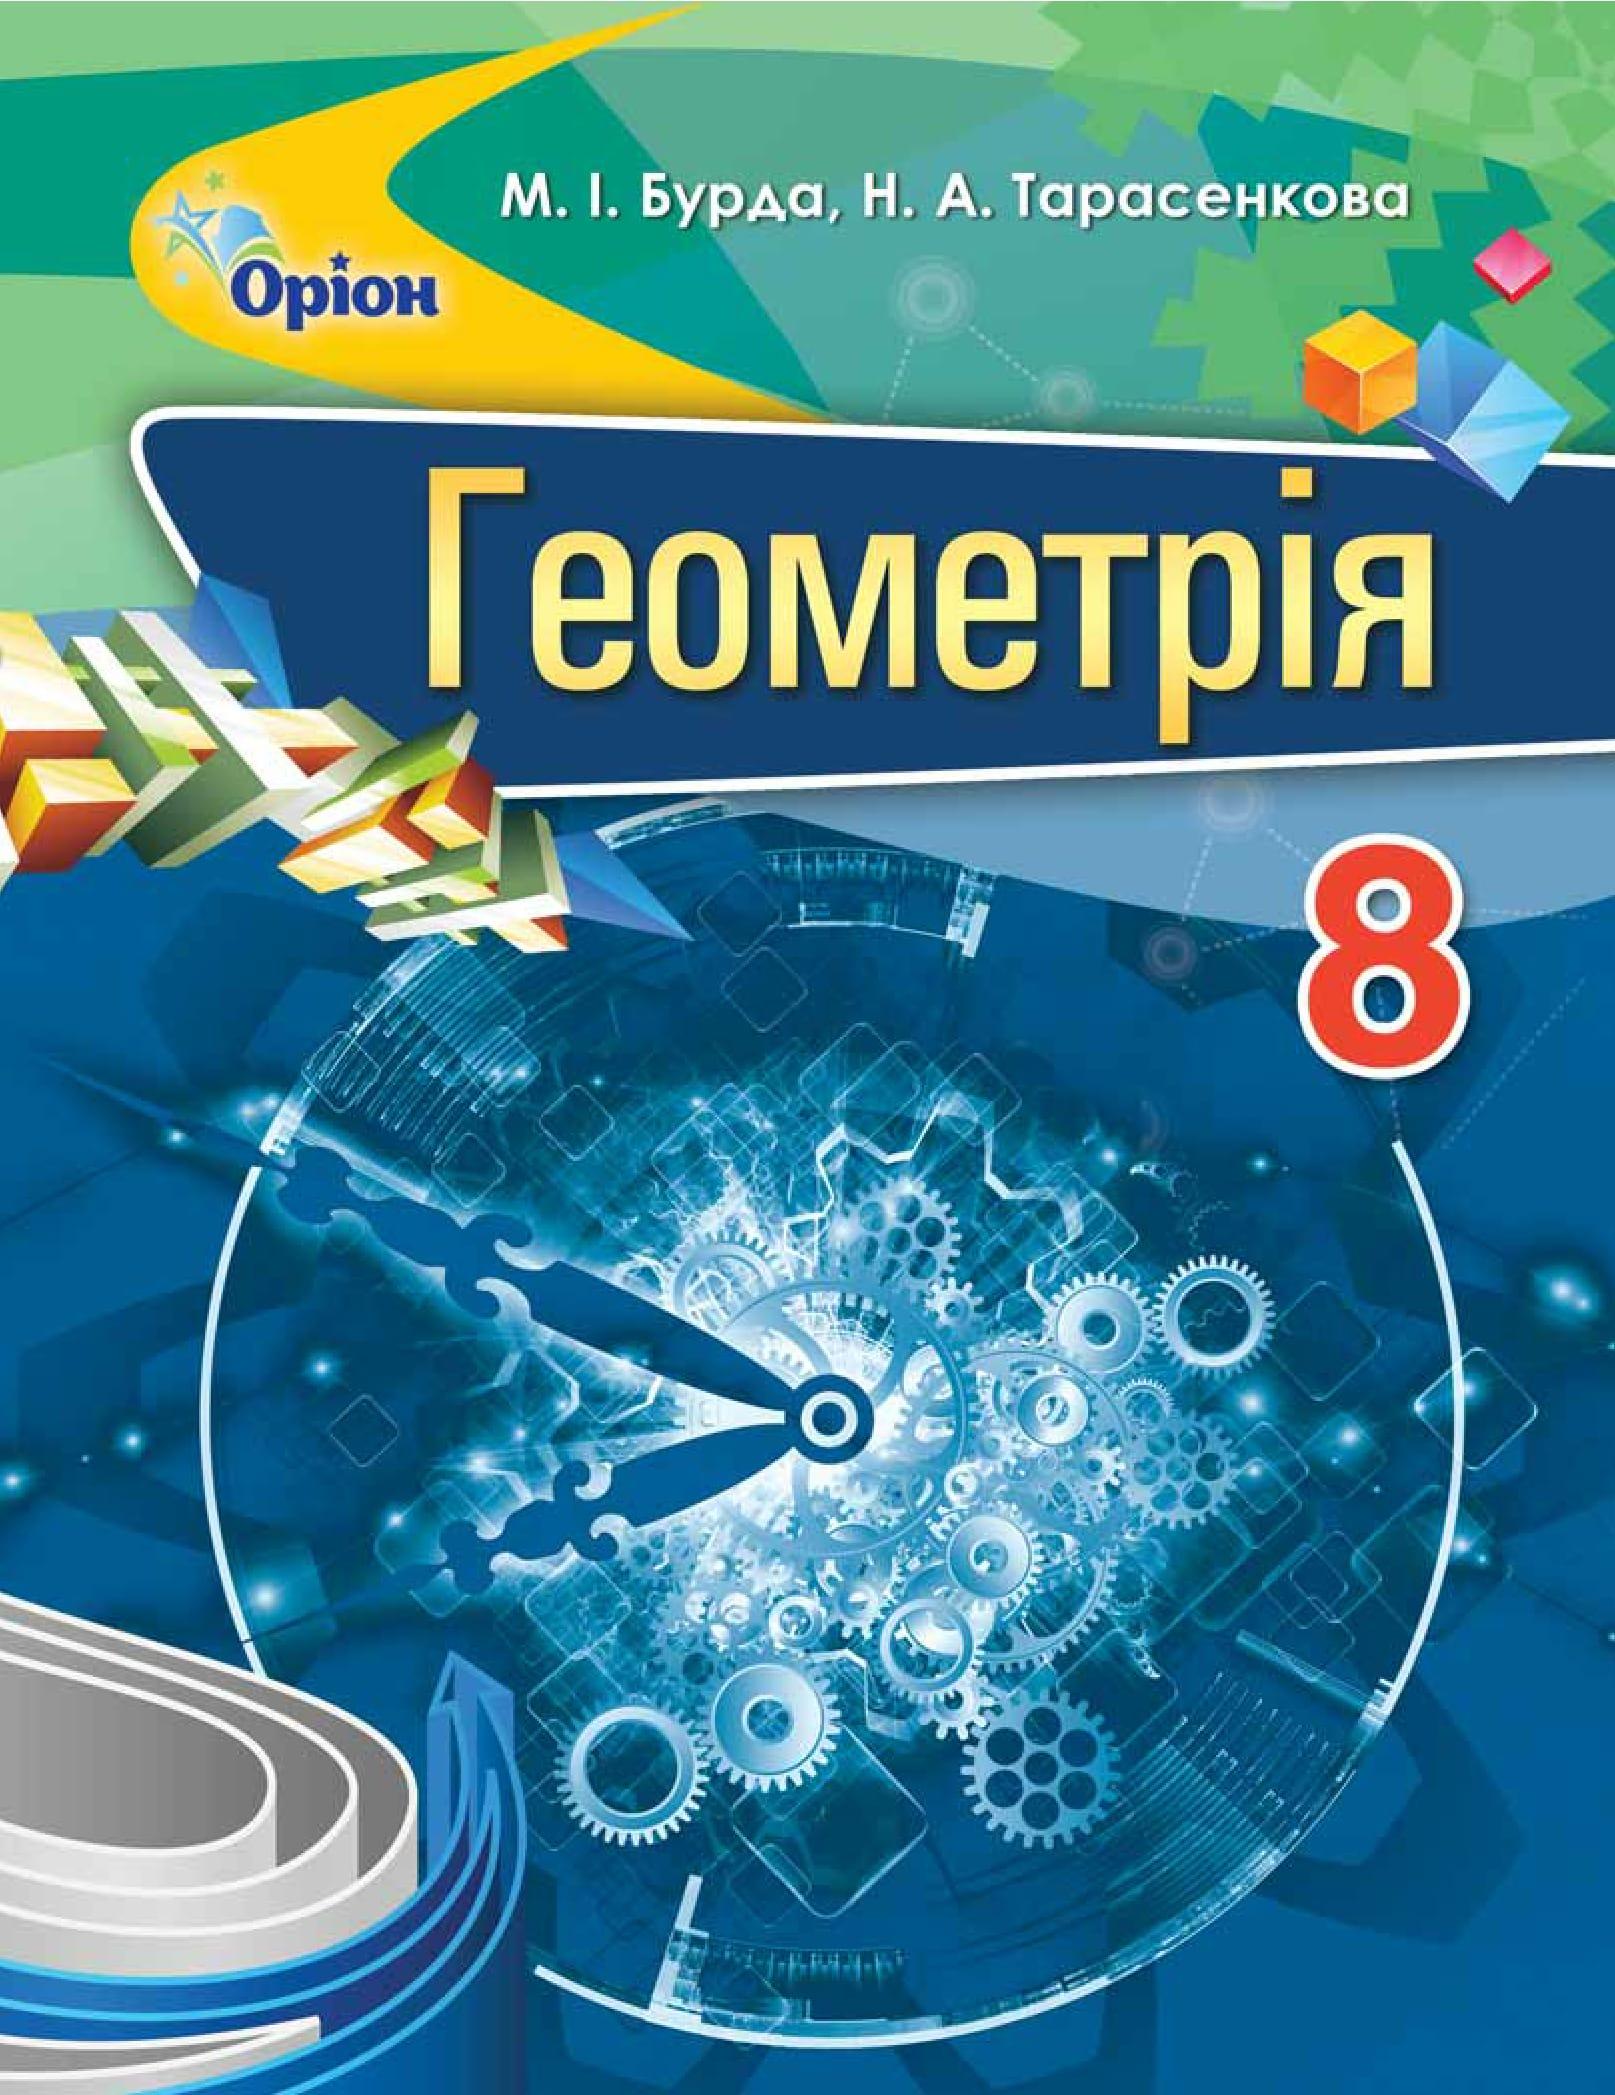 Учебник. Геометрия. 8 класс. М. И. Бурда. , н. А. Тарасенкова. Изд.